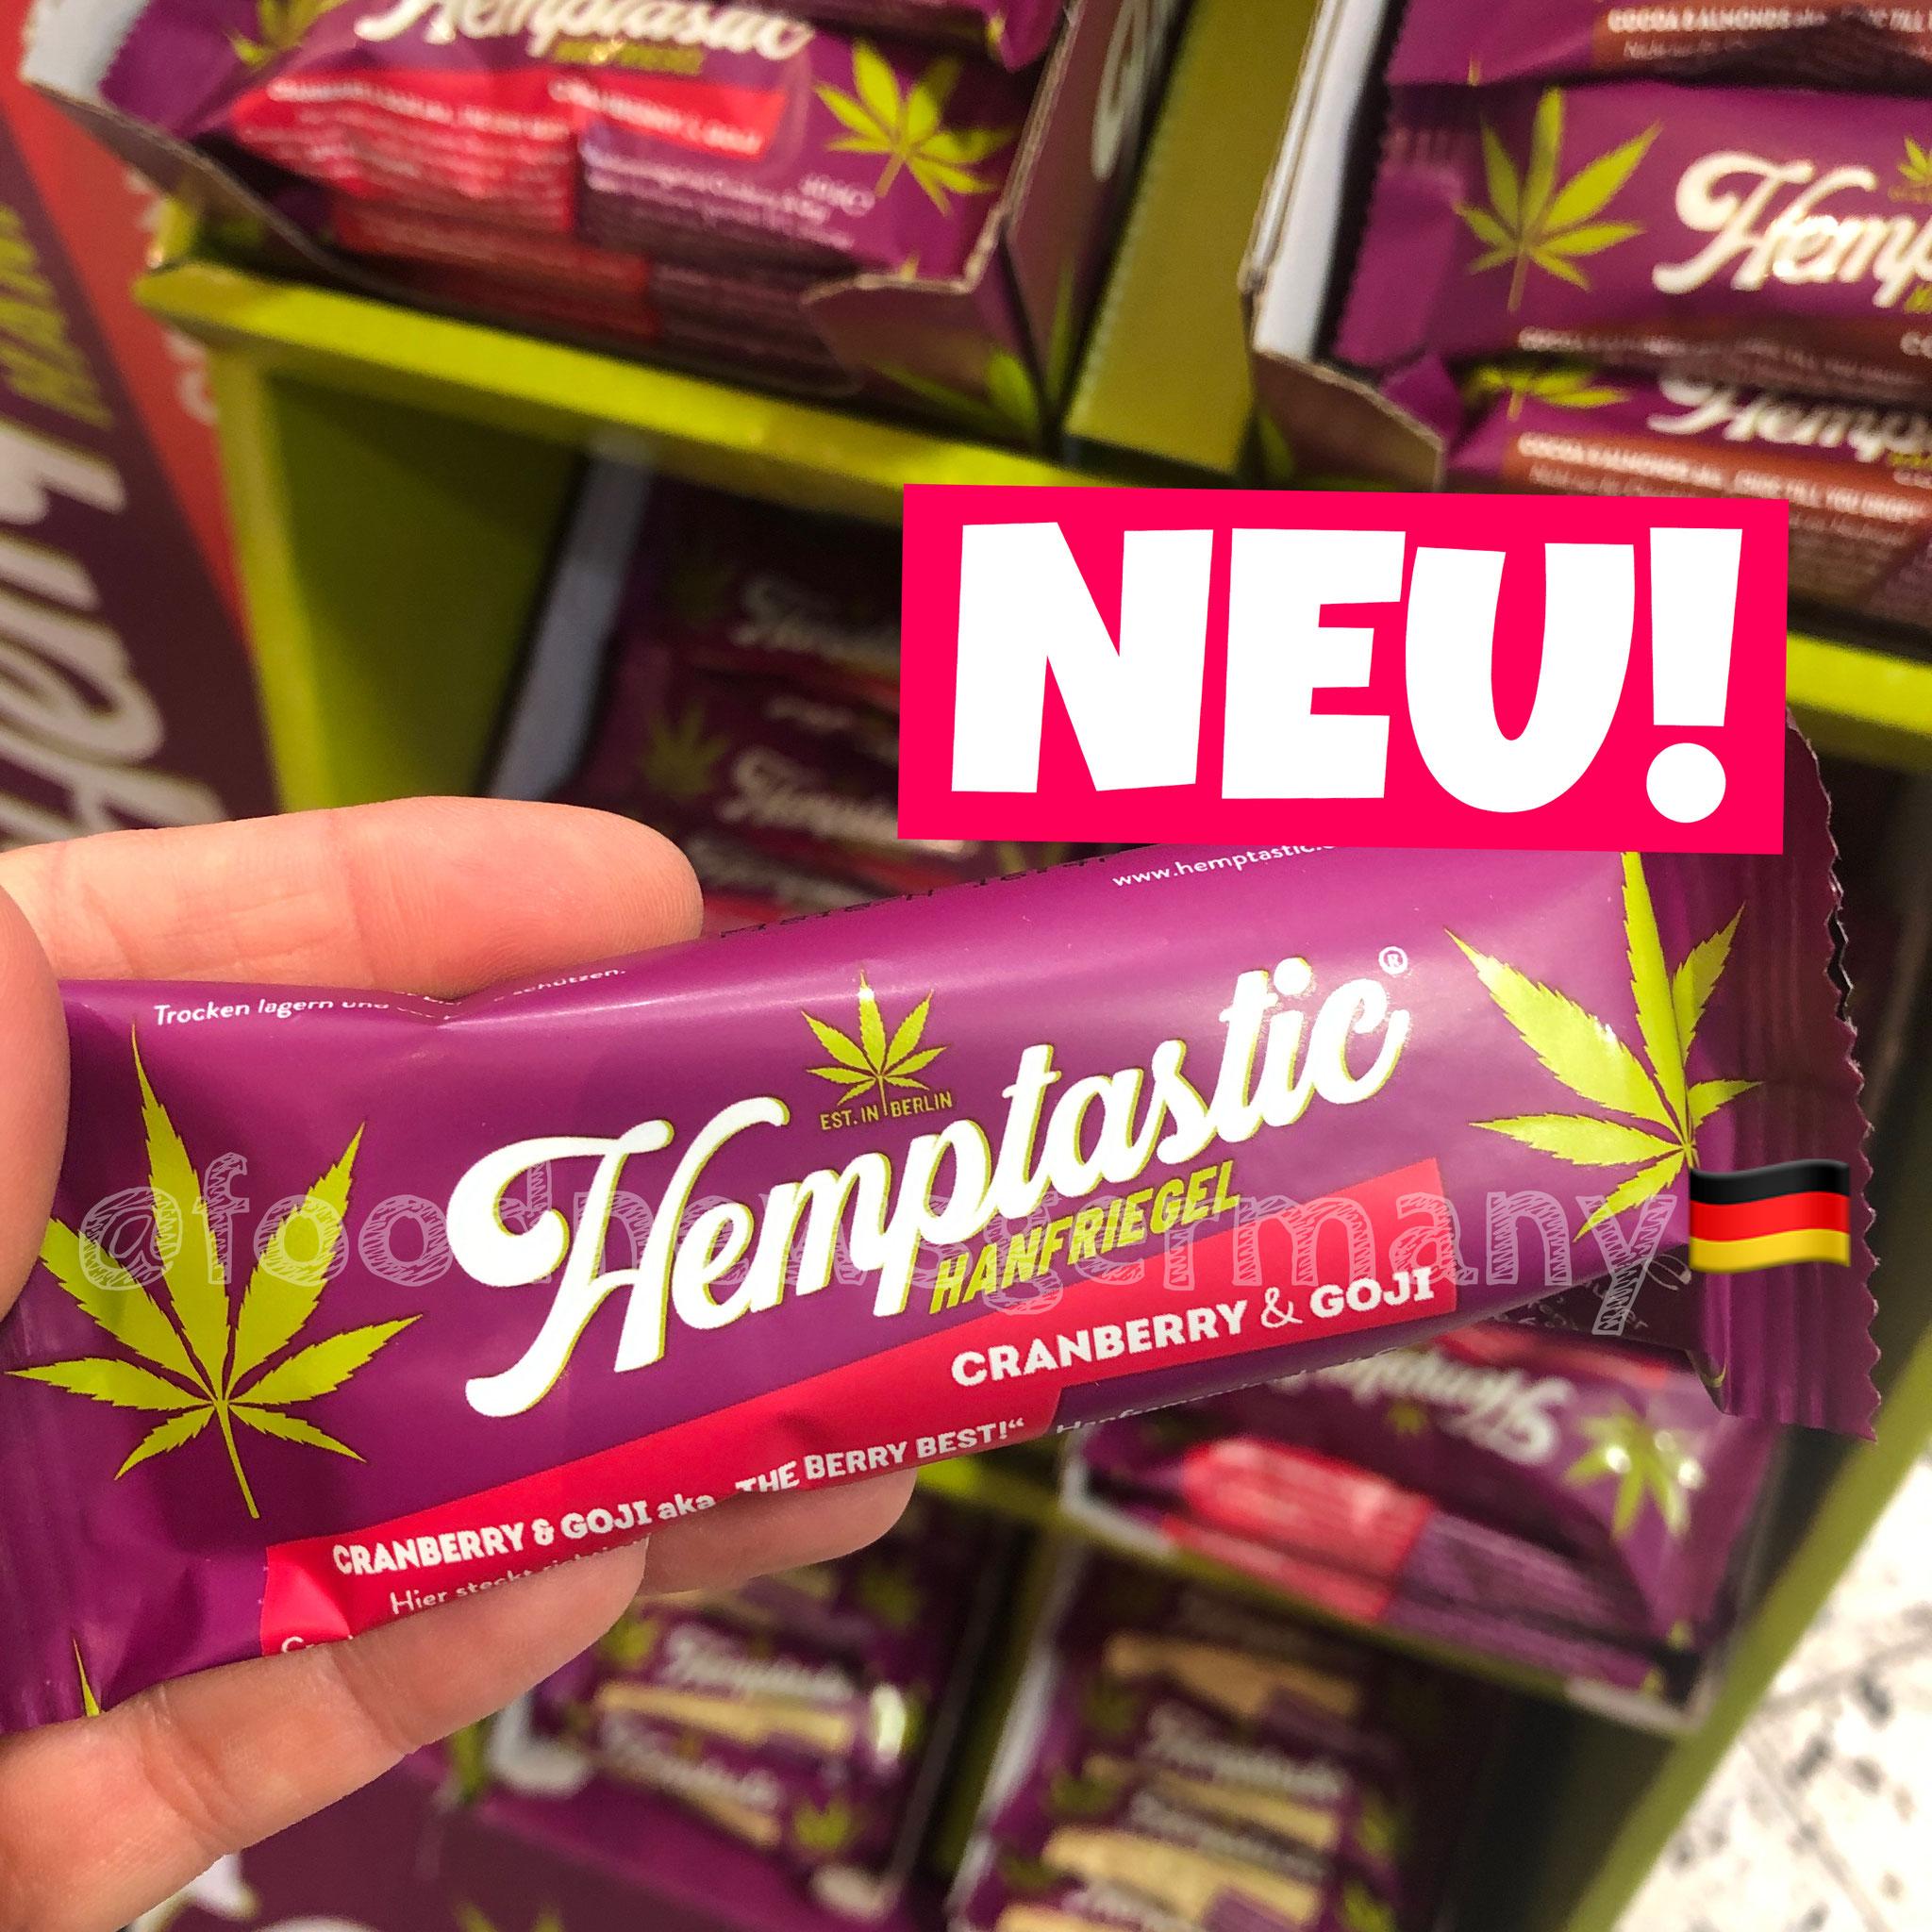 Hemptastic Hanfriegel Cranberry & Goji